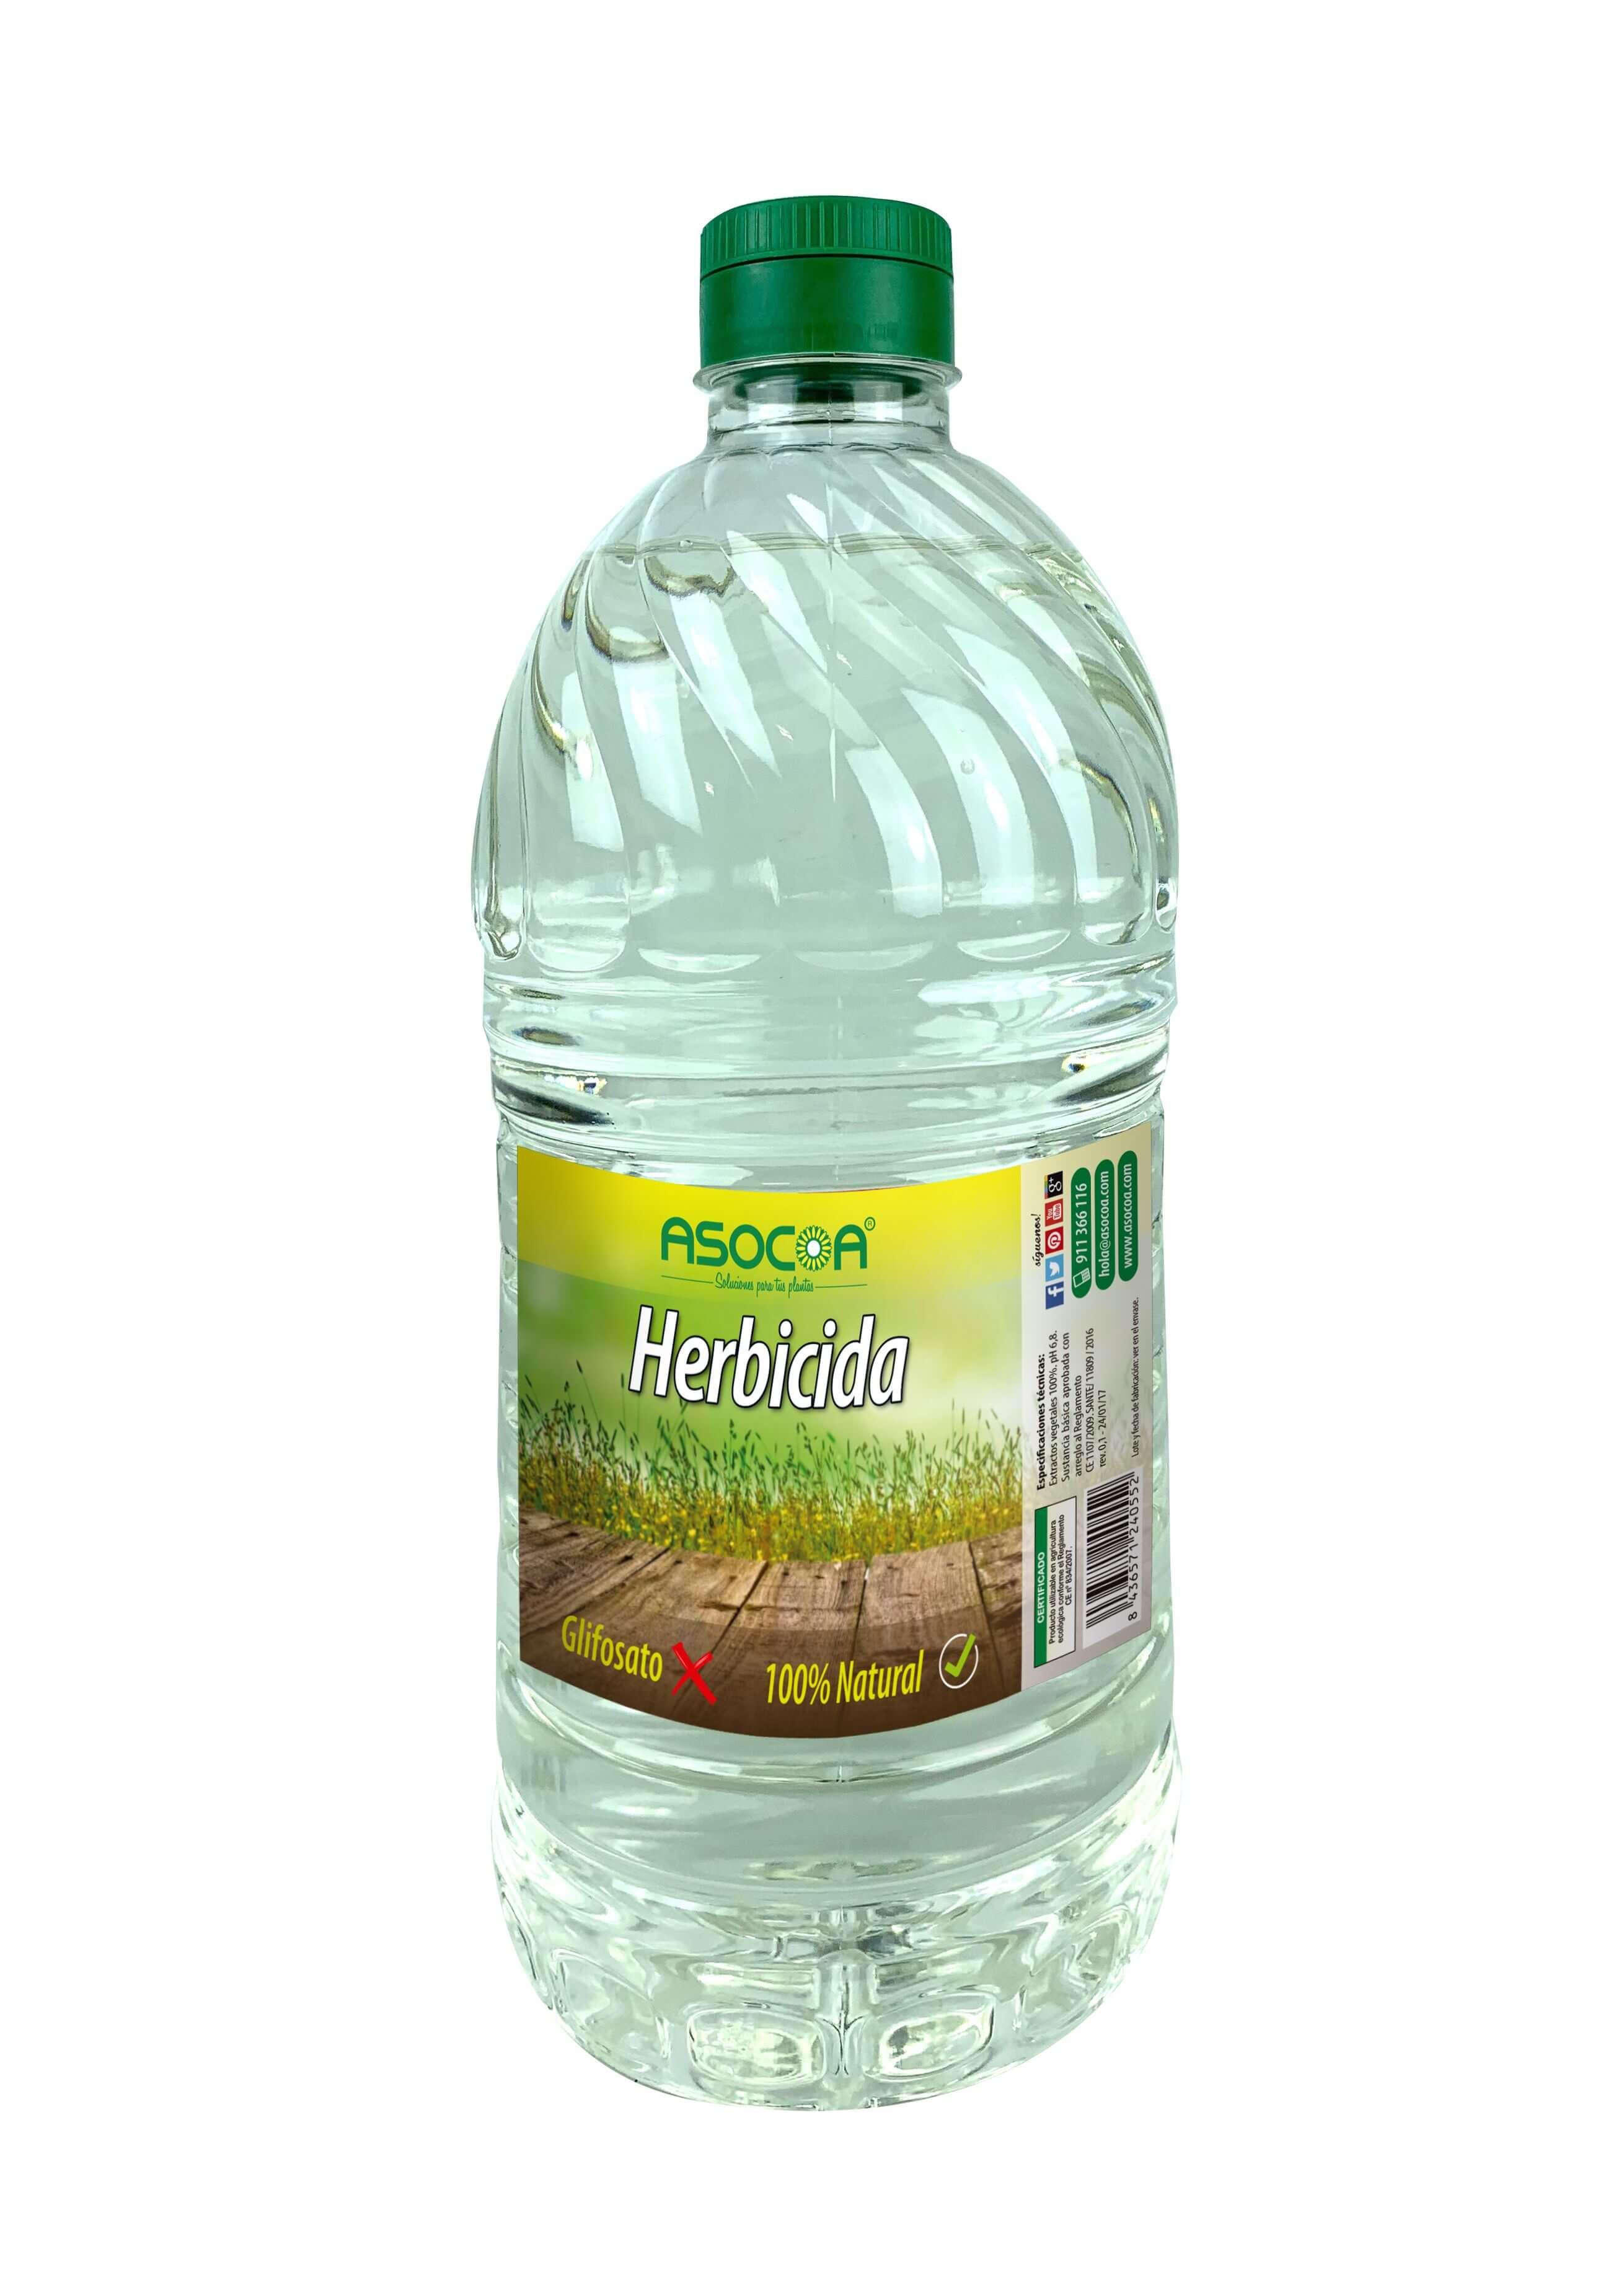 Herbicida Image